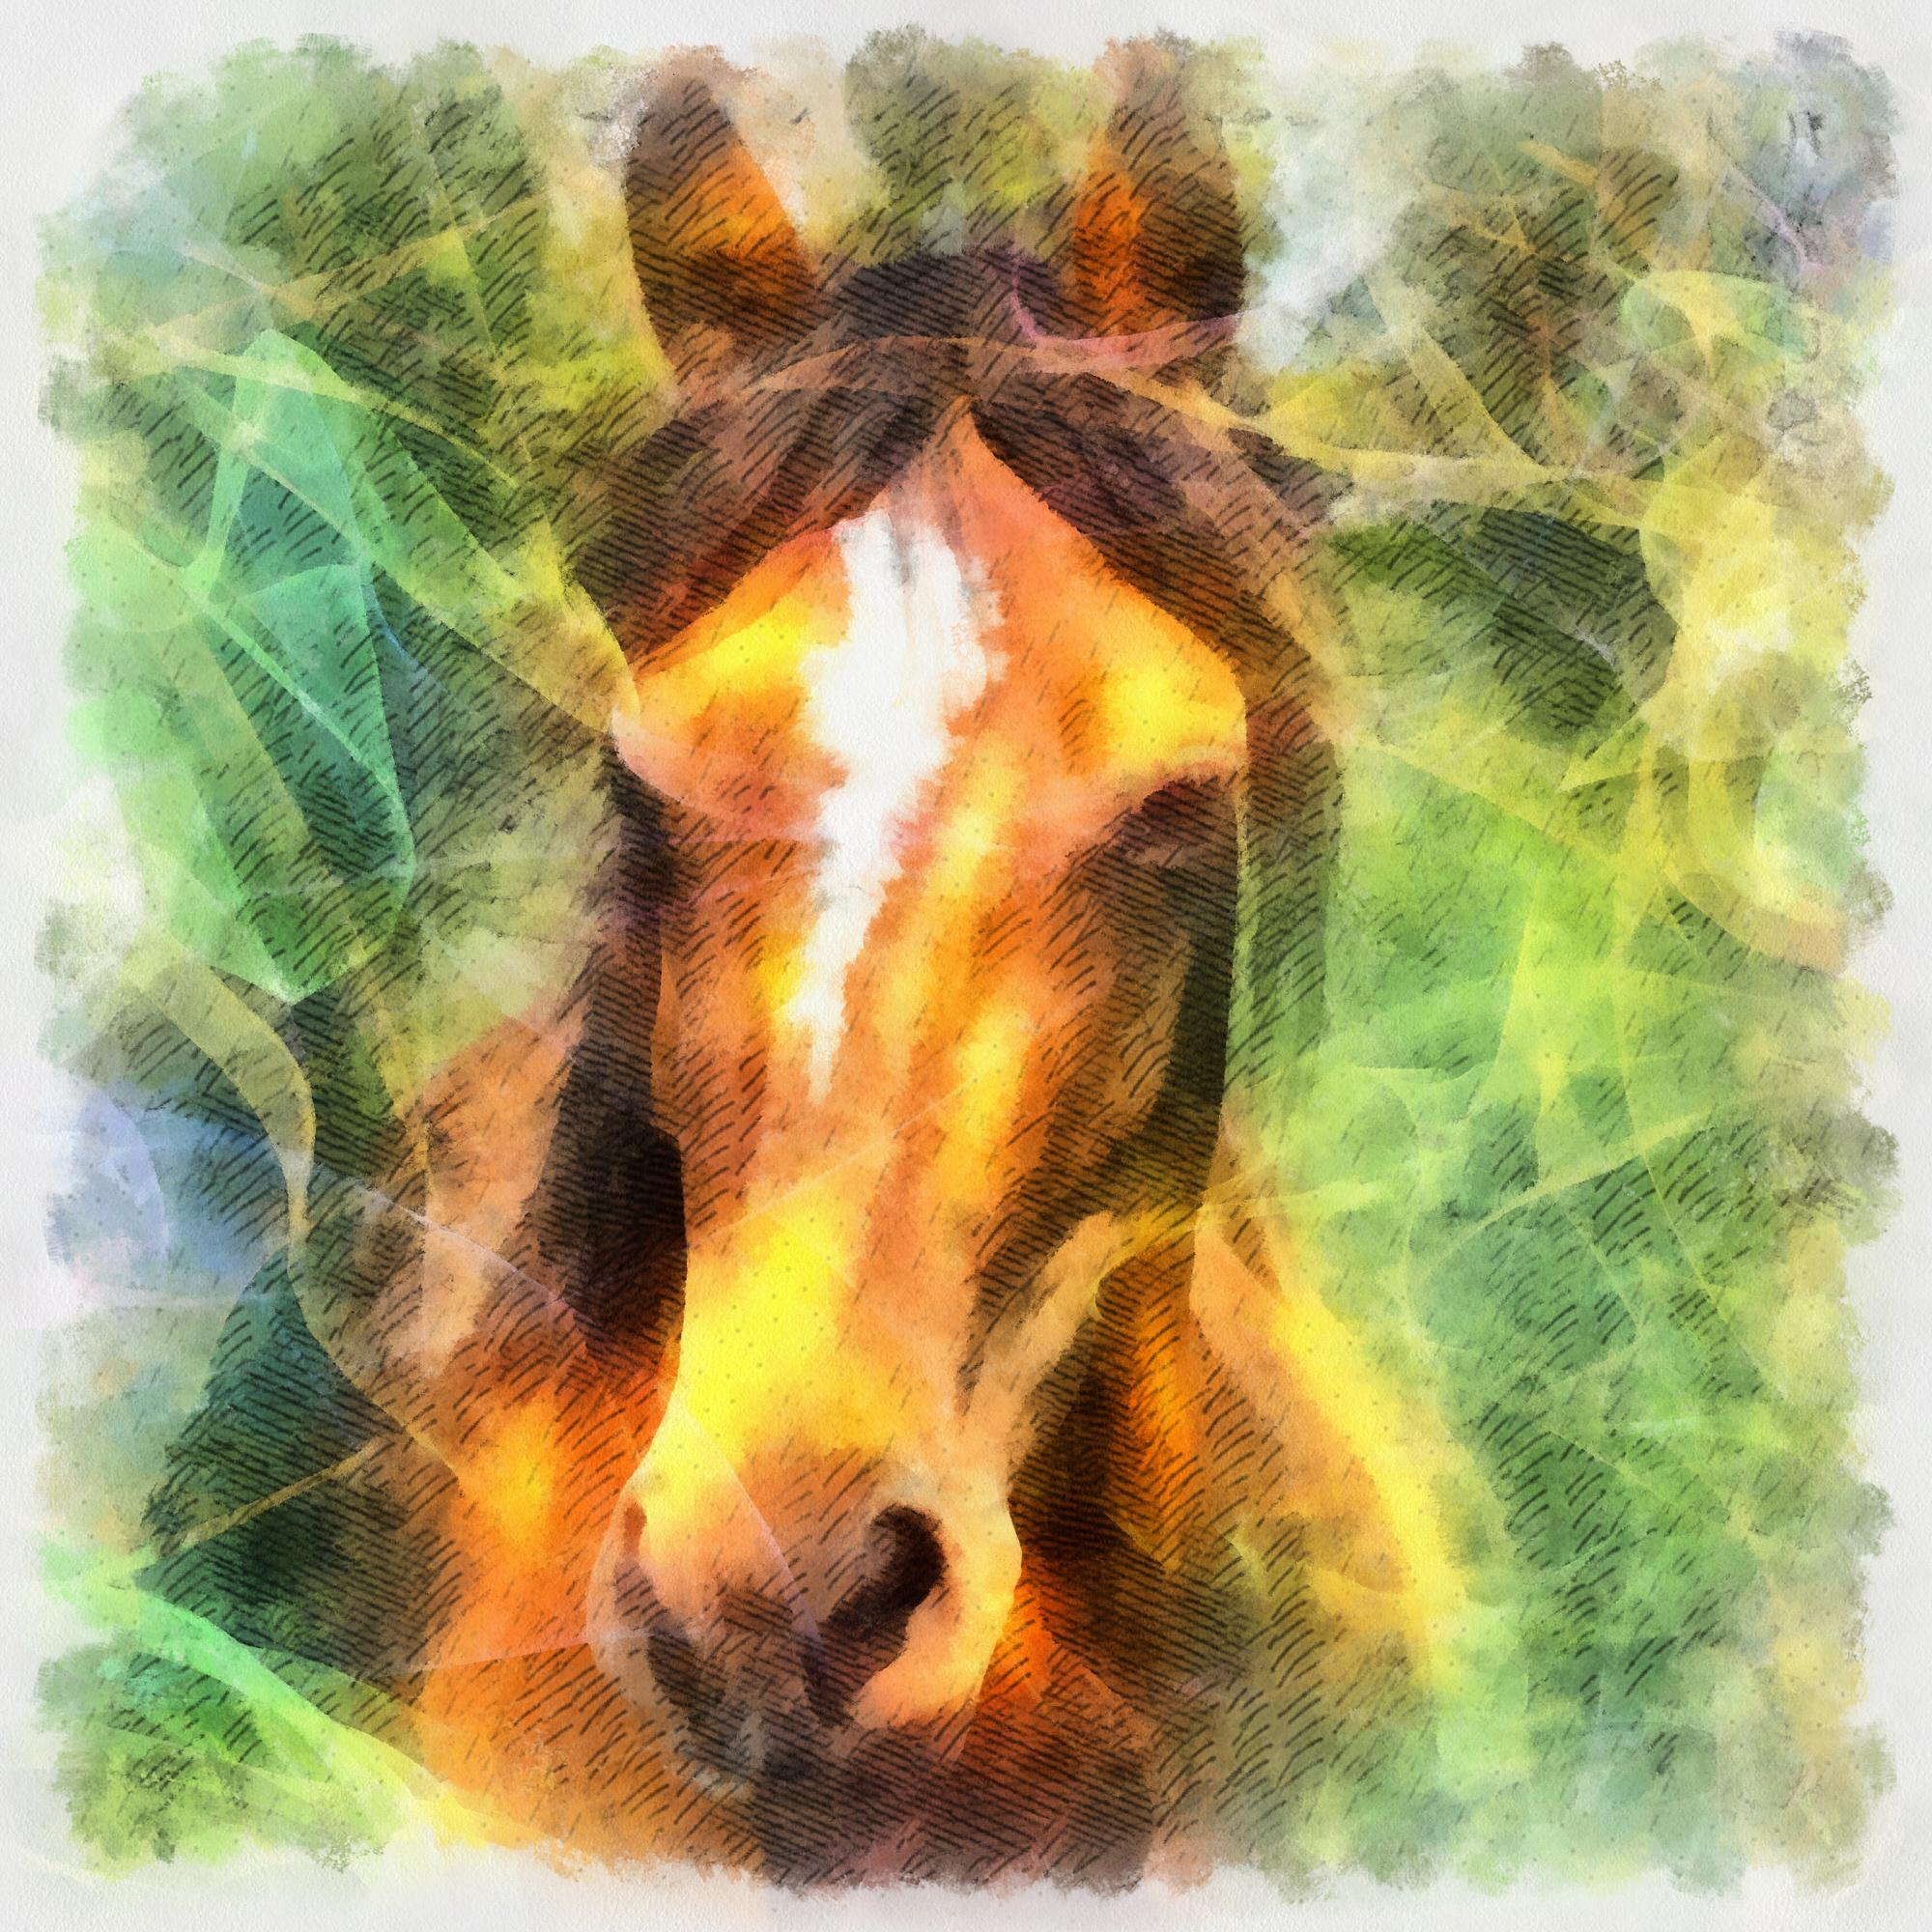 Horse Illustration, Animal, Art, Clipart, Graphic, HQ Photo